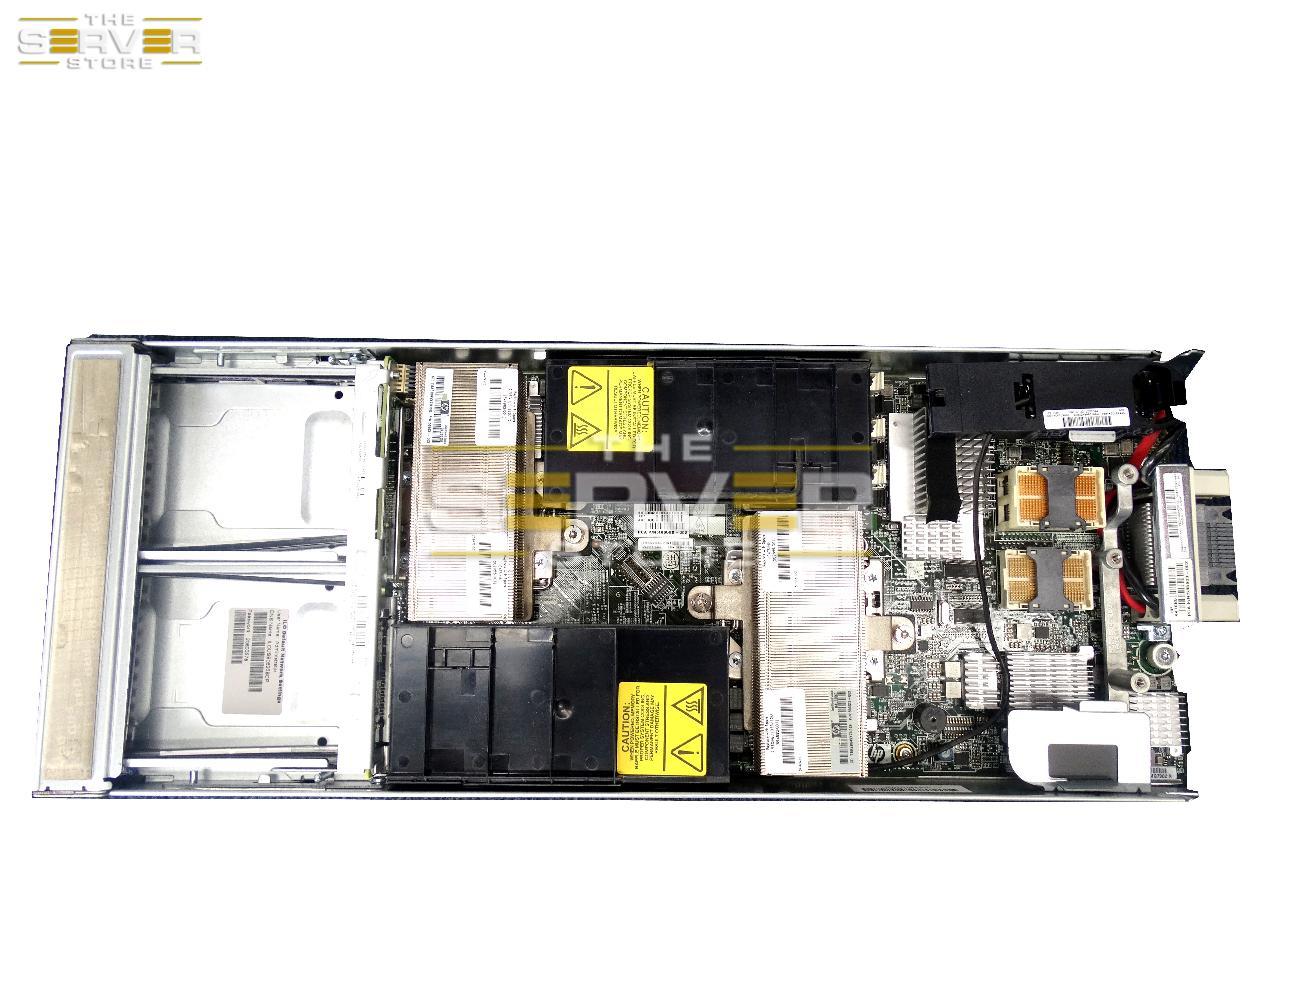 Server HP BL460C G7 2x L5640 2.26GHz 6 CORE 24GB - 1